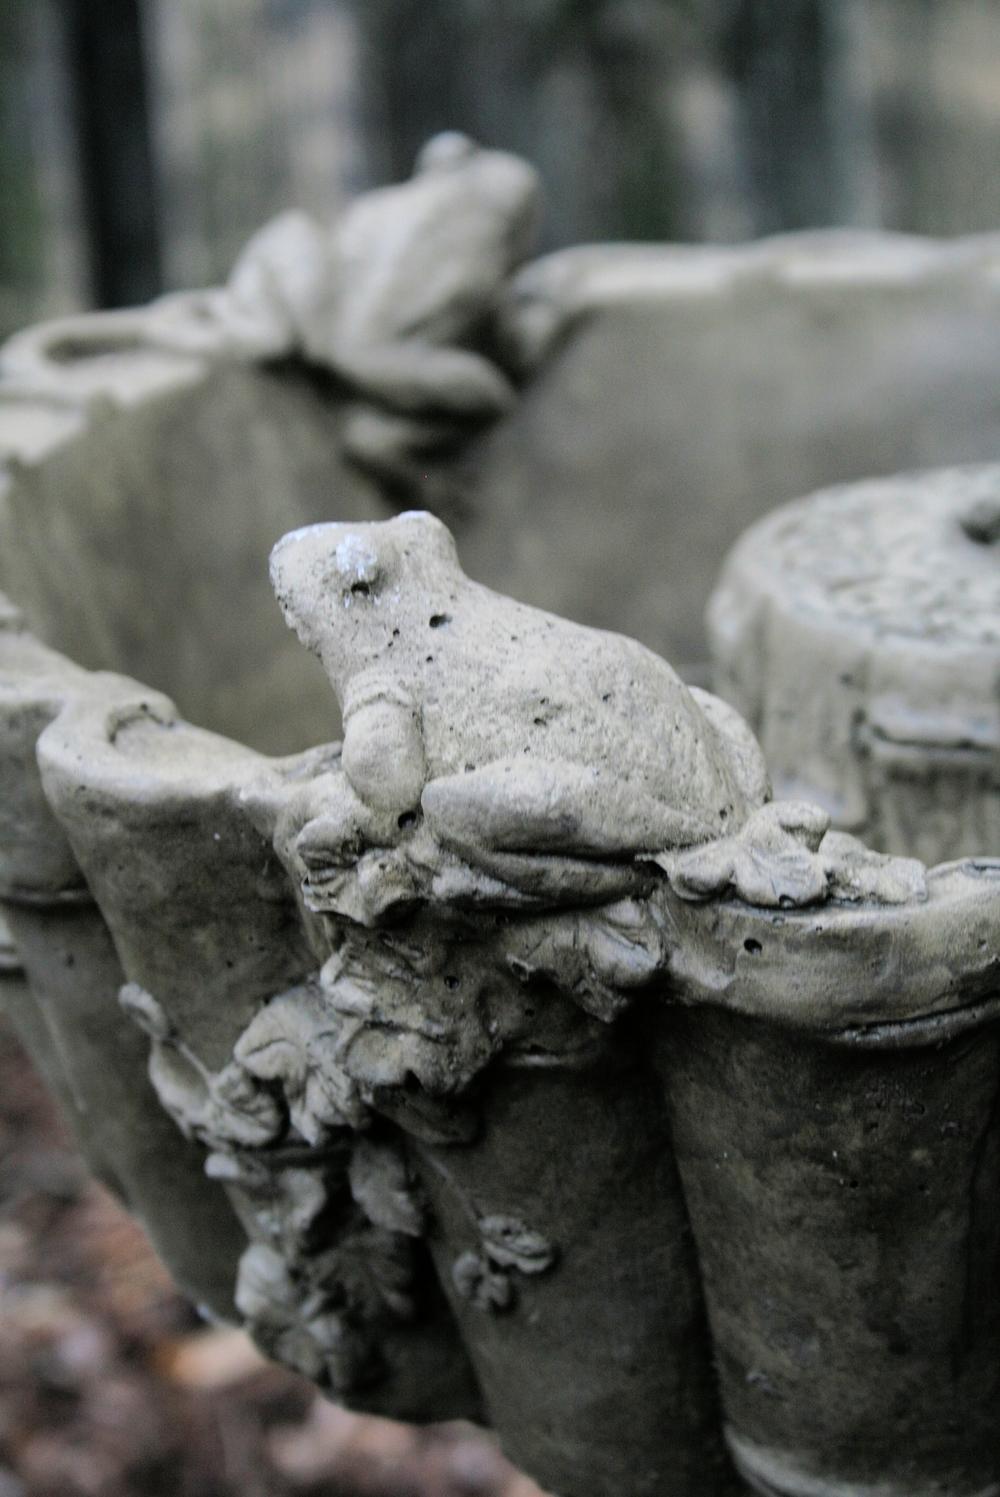 stonecasting artistic resized.jpg